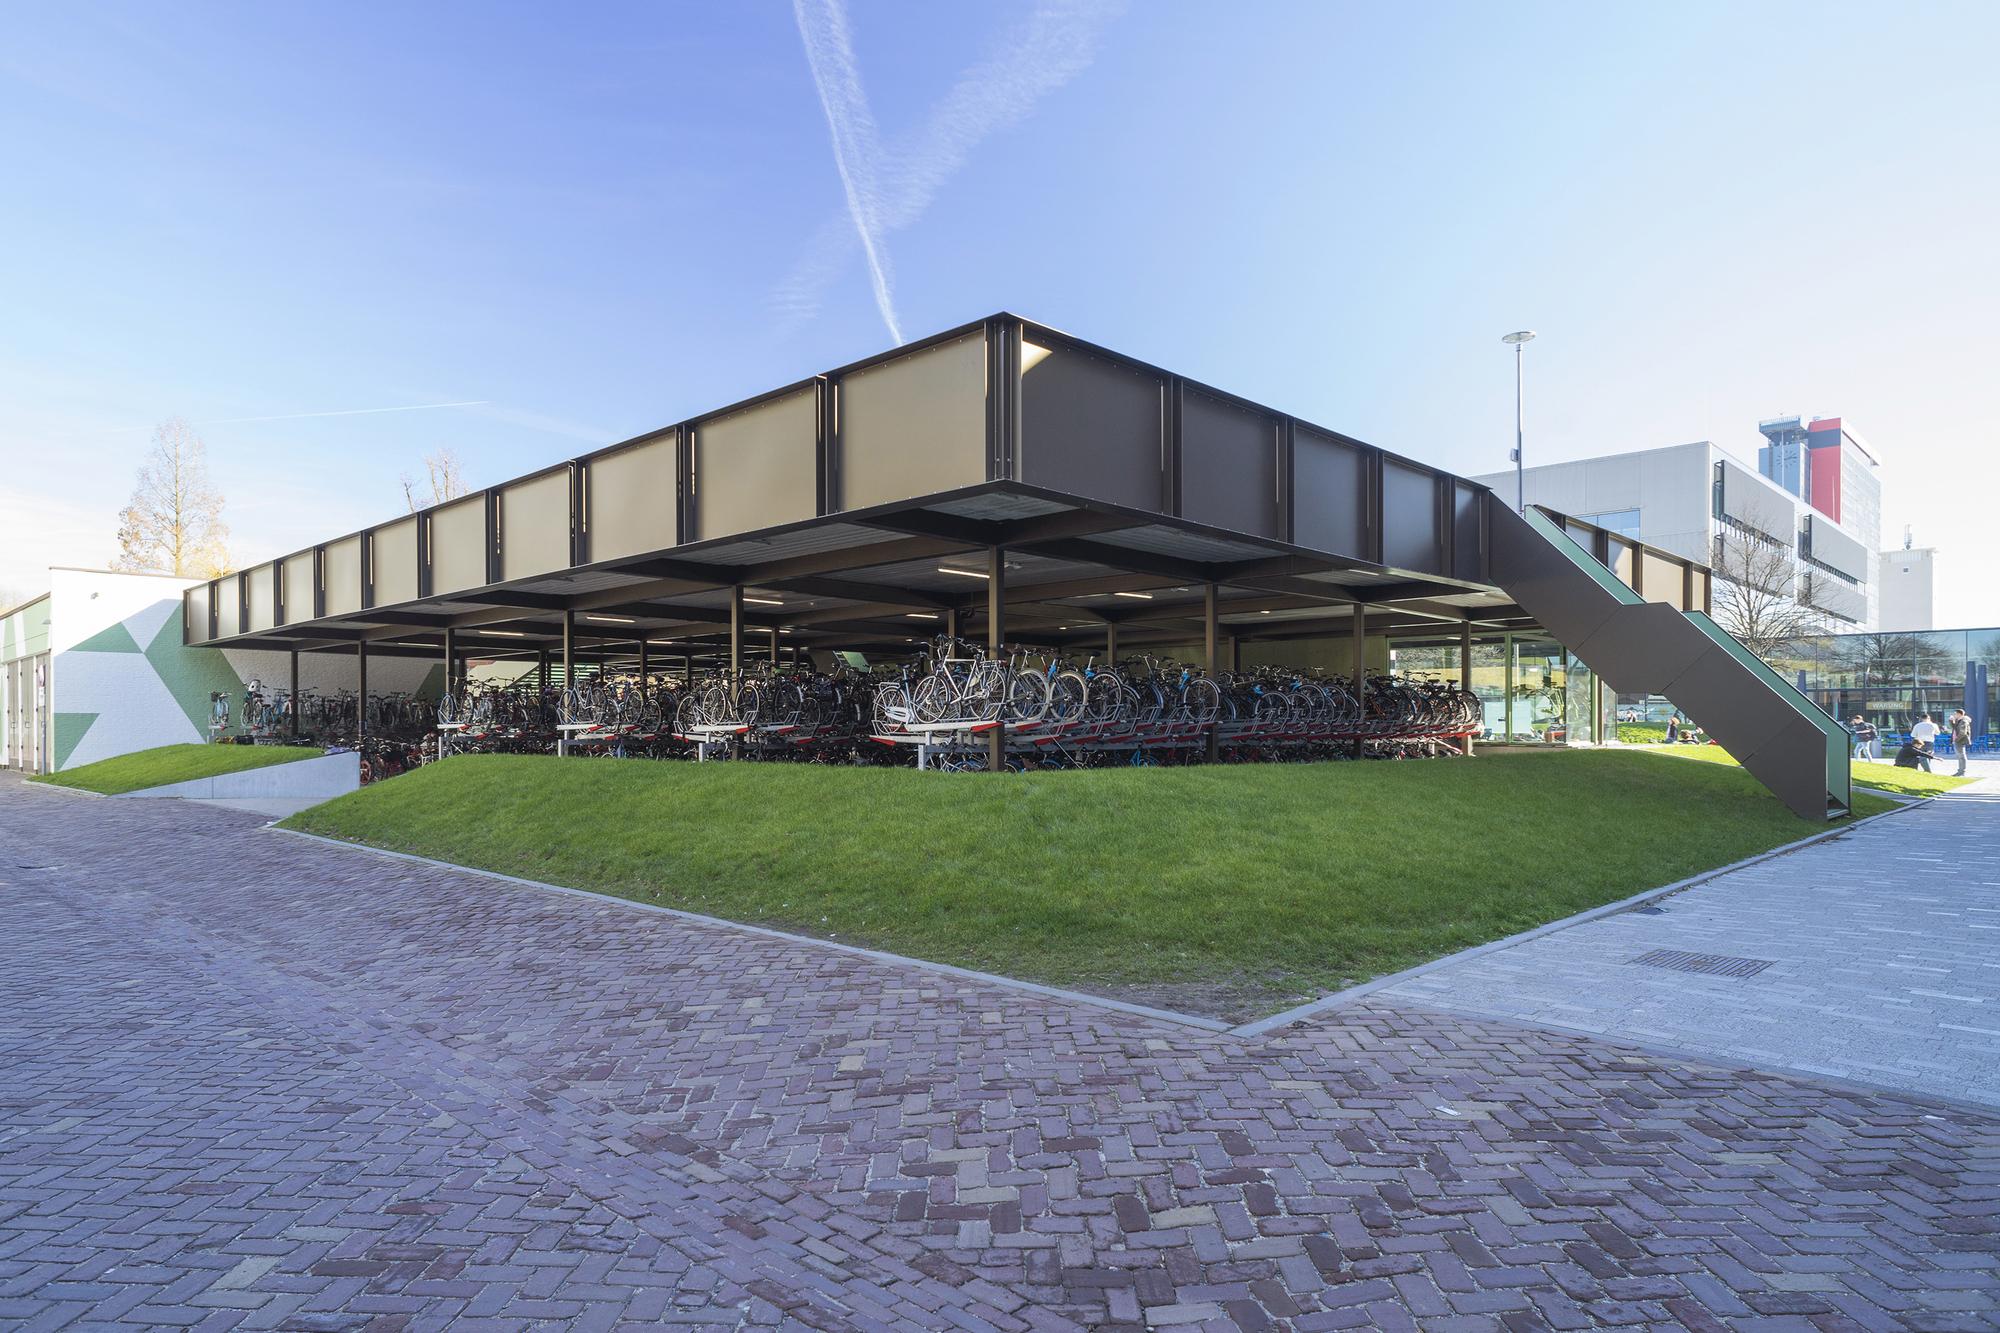 Coffee And Bikes Bureauvaneig Biq Architecten Archdaily